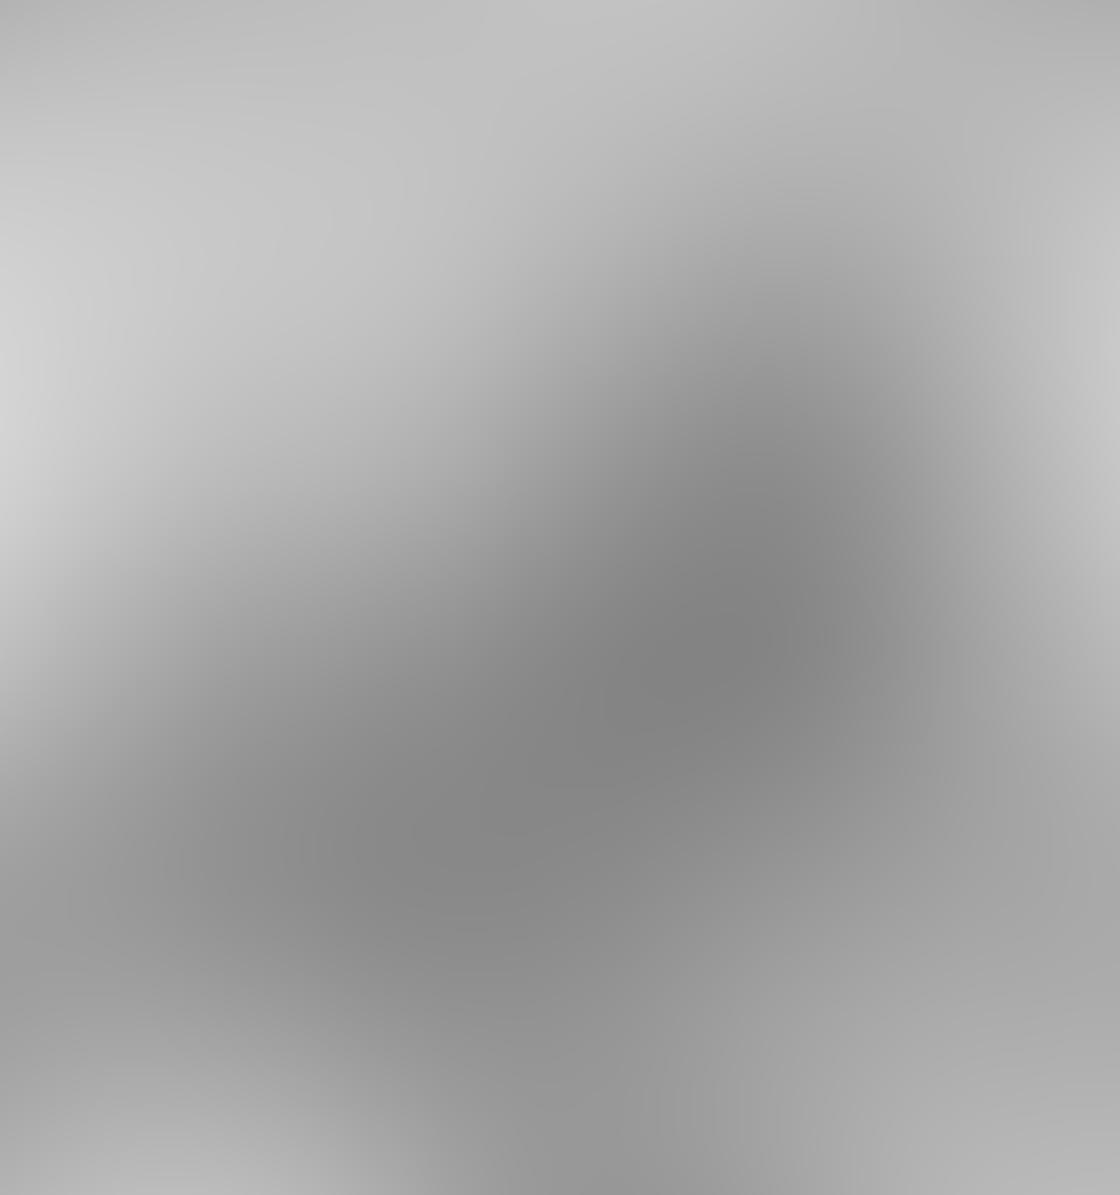 iPhone Photos Low Angle 10